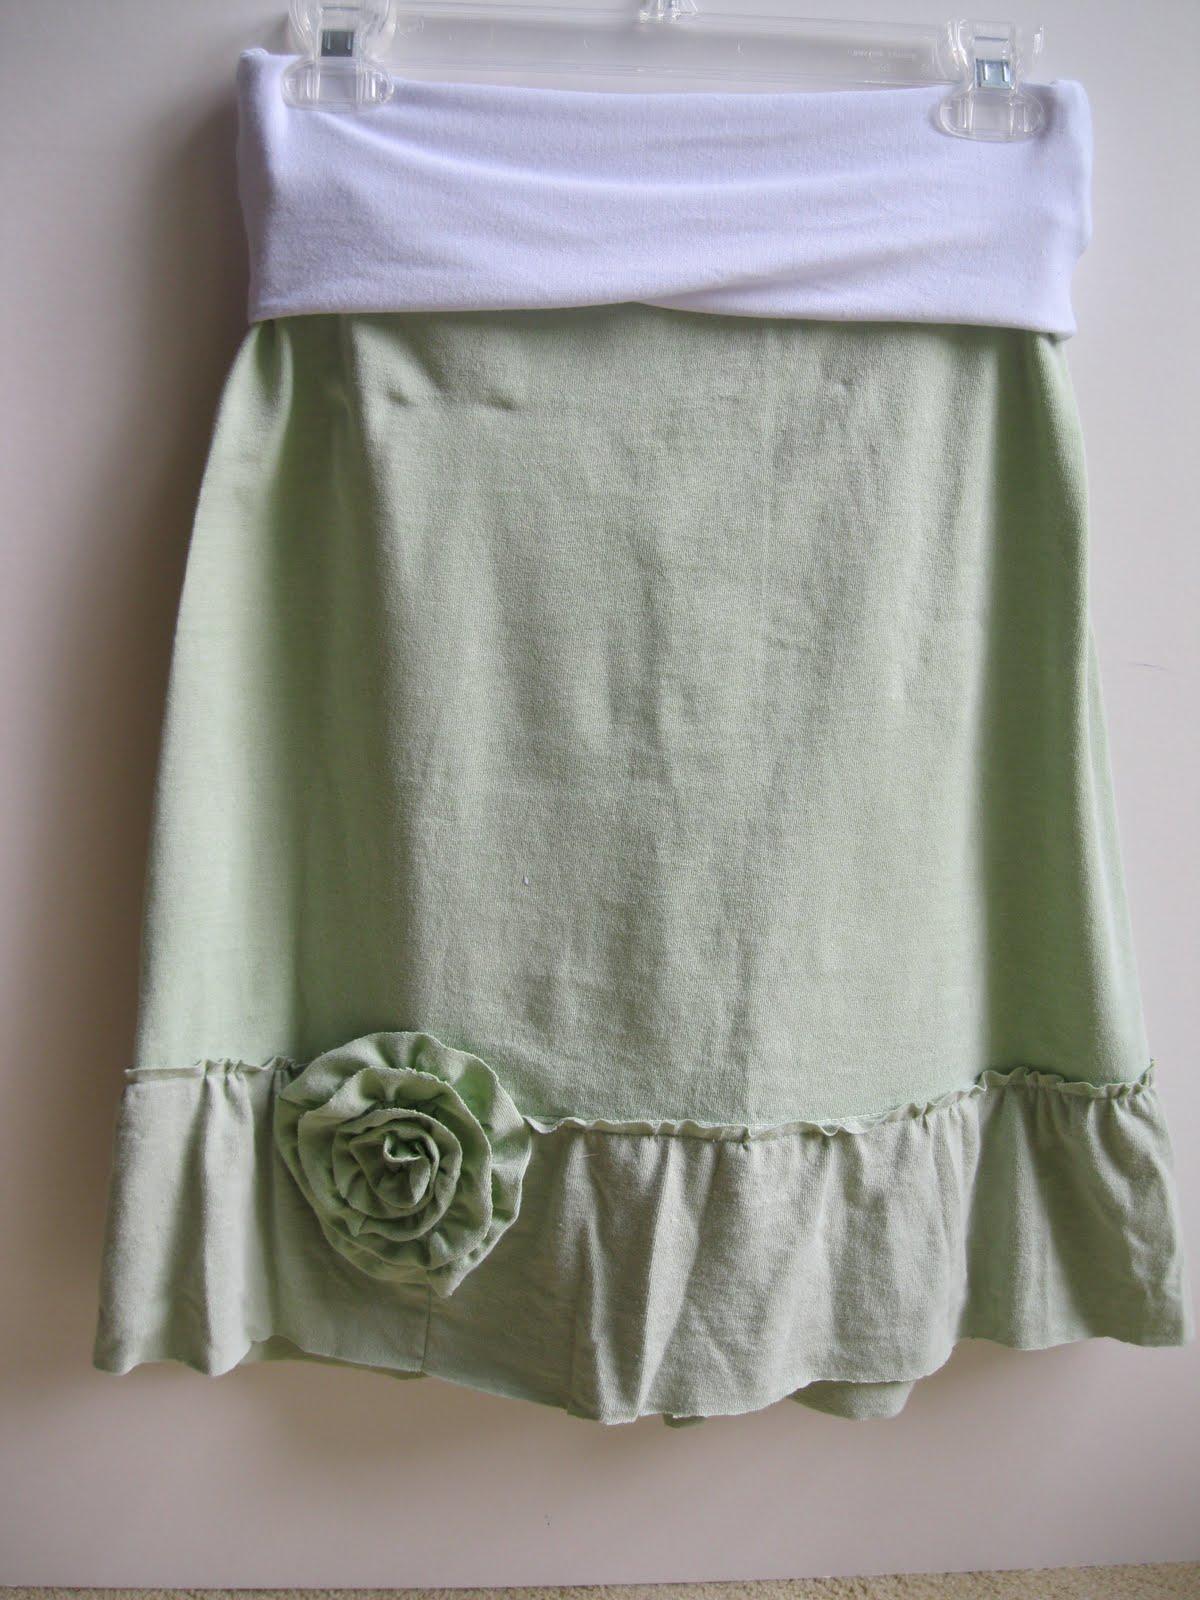 Monkey See, Monkey Do!: Ruffle T-Shirt Skirt